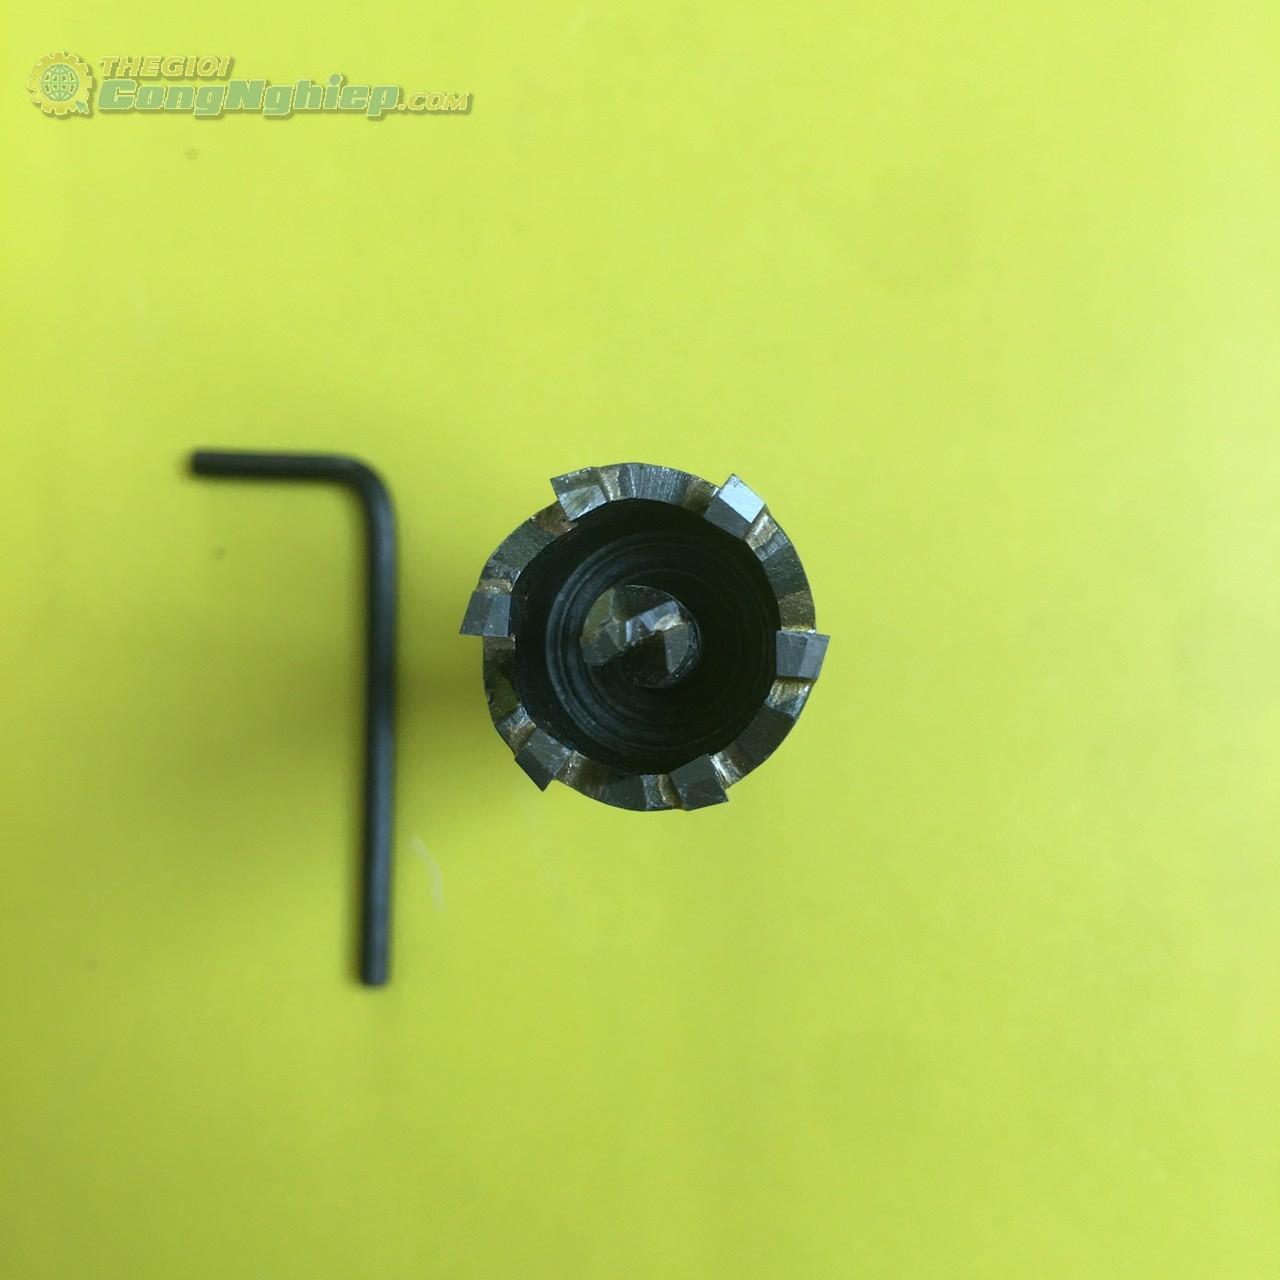 Iron nose TGCN-50536 THANGLOI